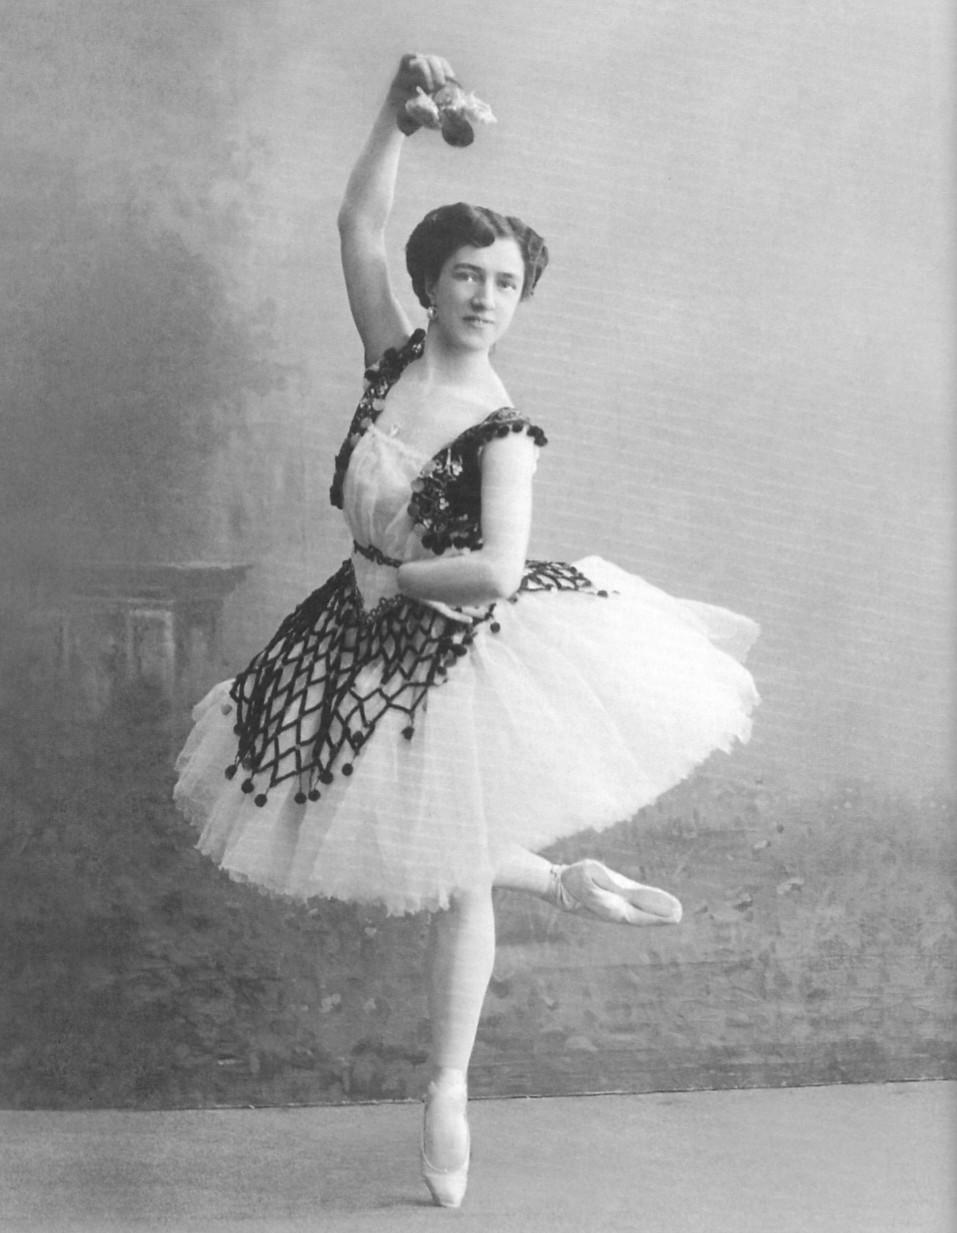 Agrippina_Vaganova_-Esmeralda_1910.jpg